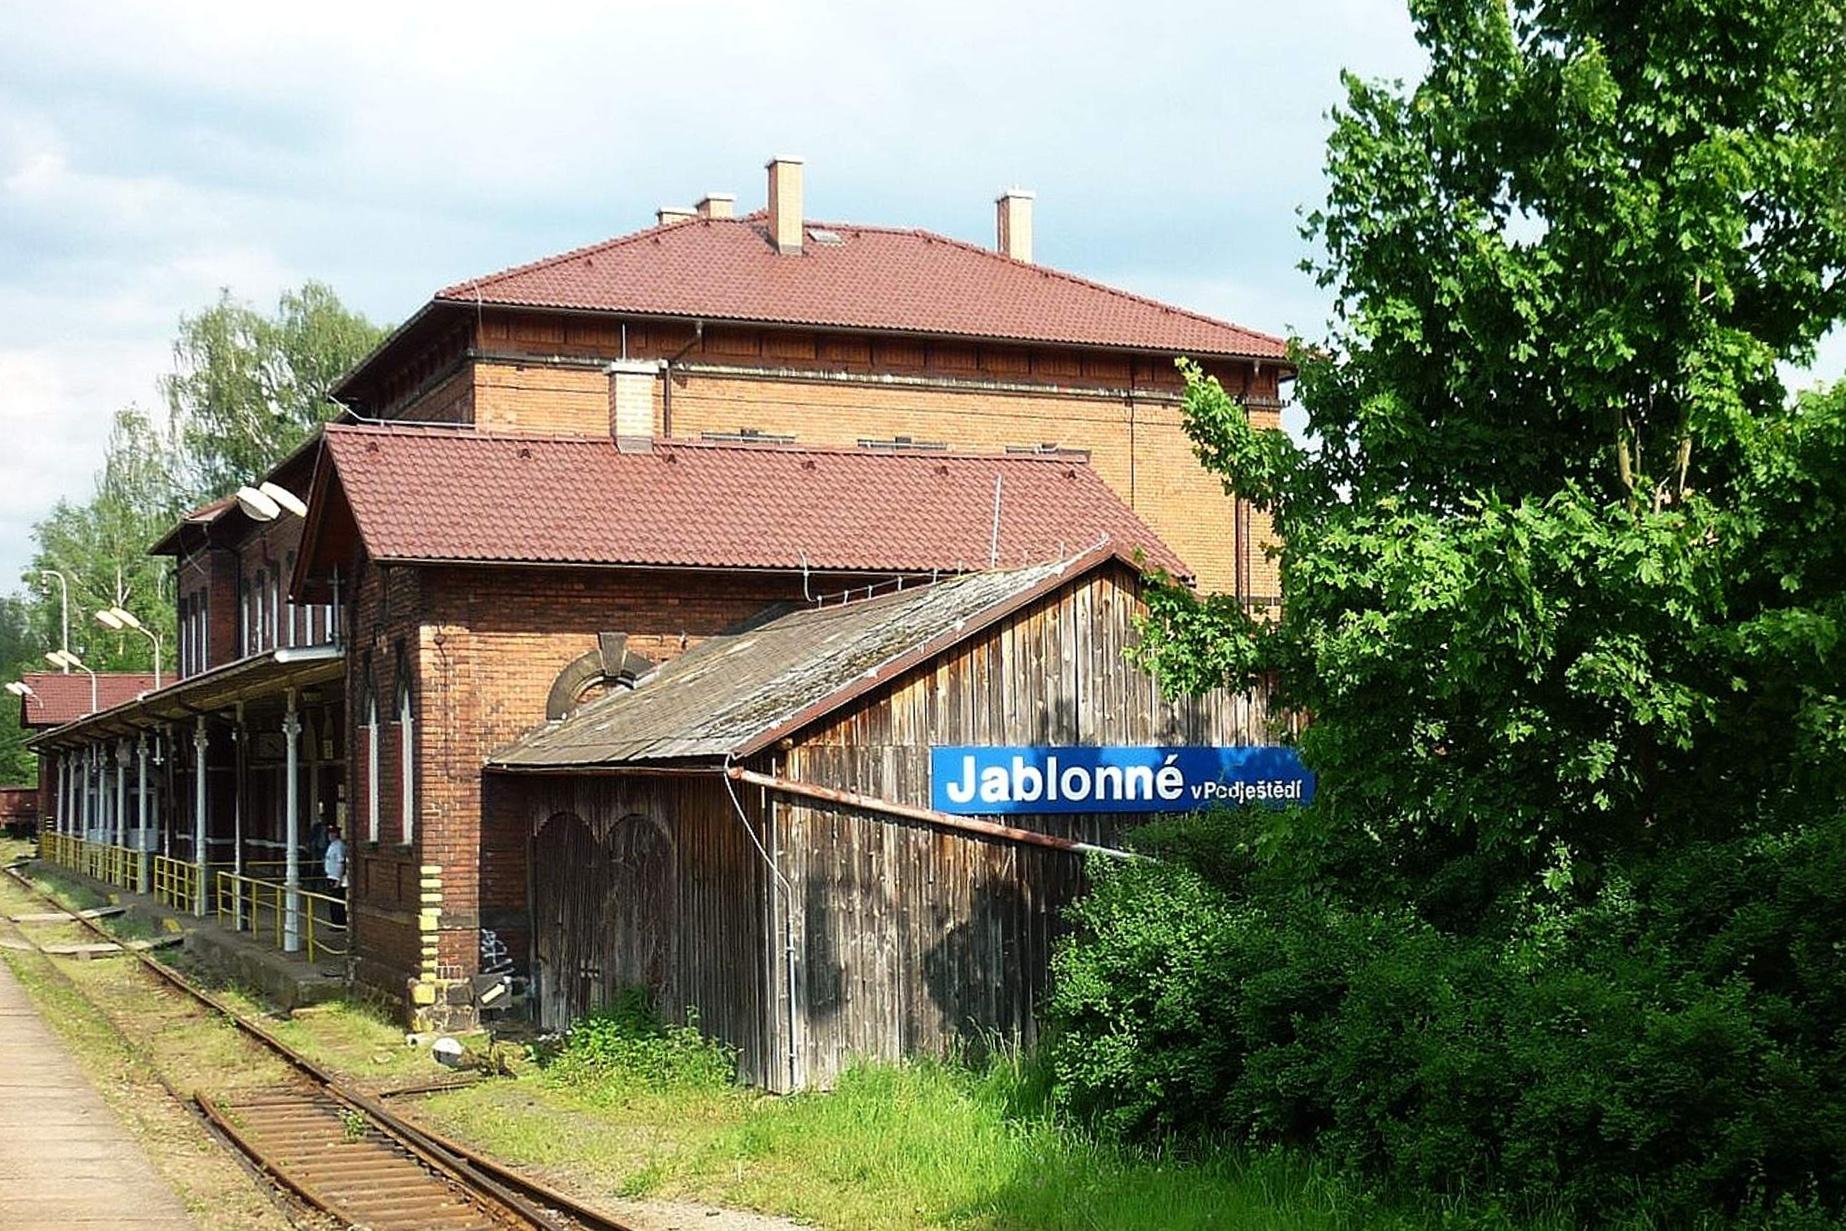 Nemovitosti Jablonn v Podjetd | alahlia.info